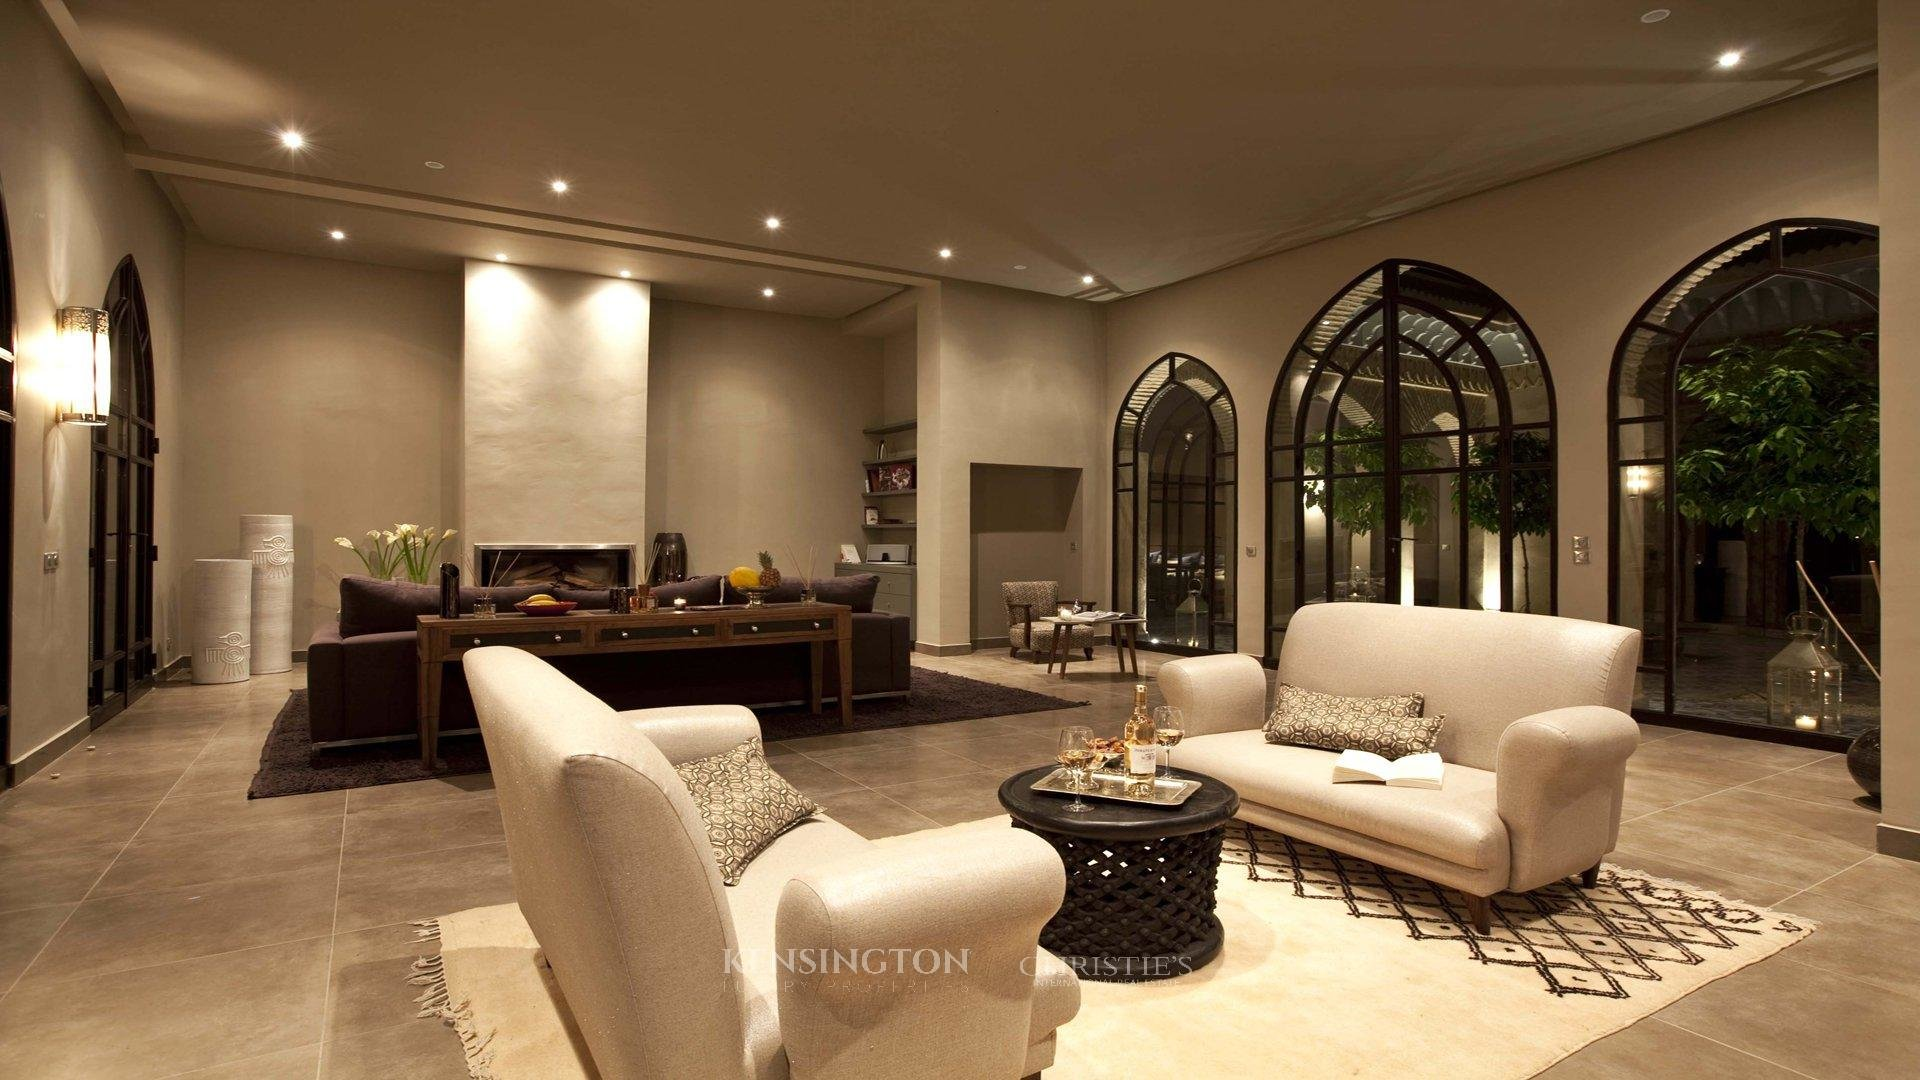 KPPM00564 Kappa Villa Luxury Marrakech Morocco